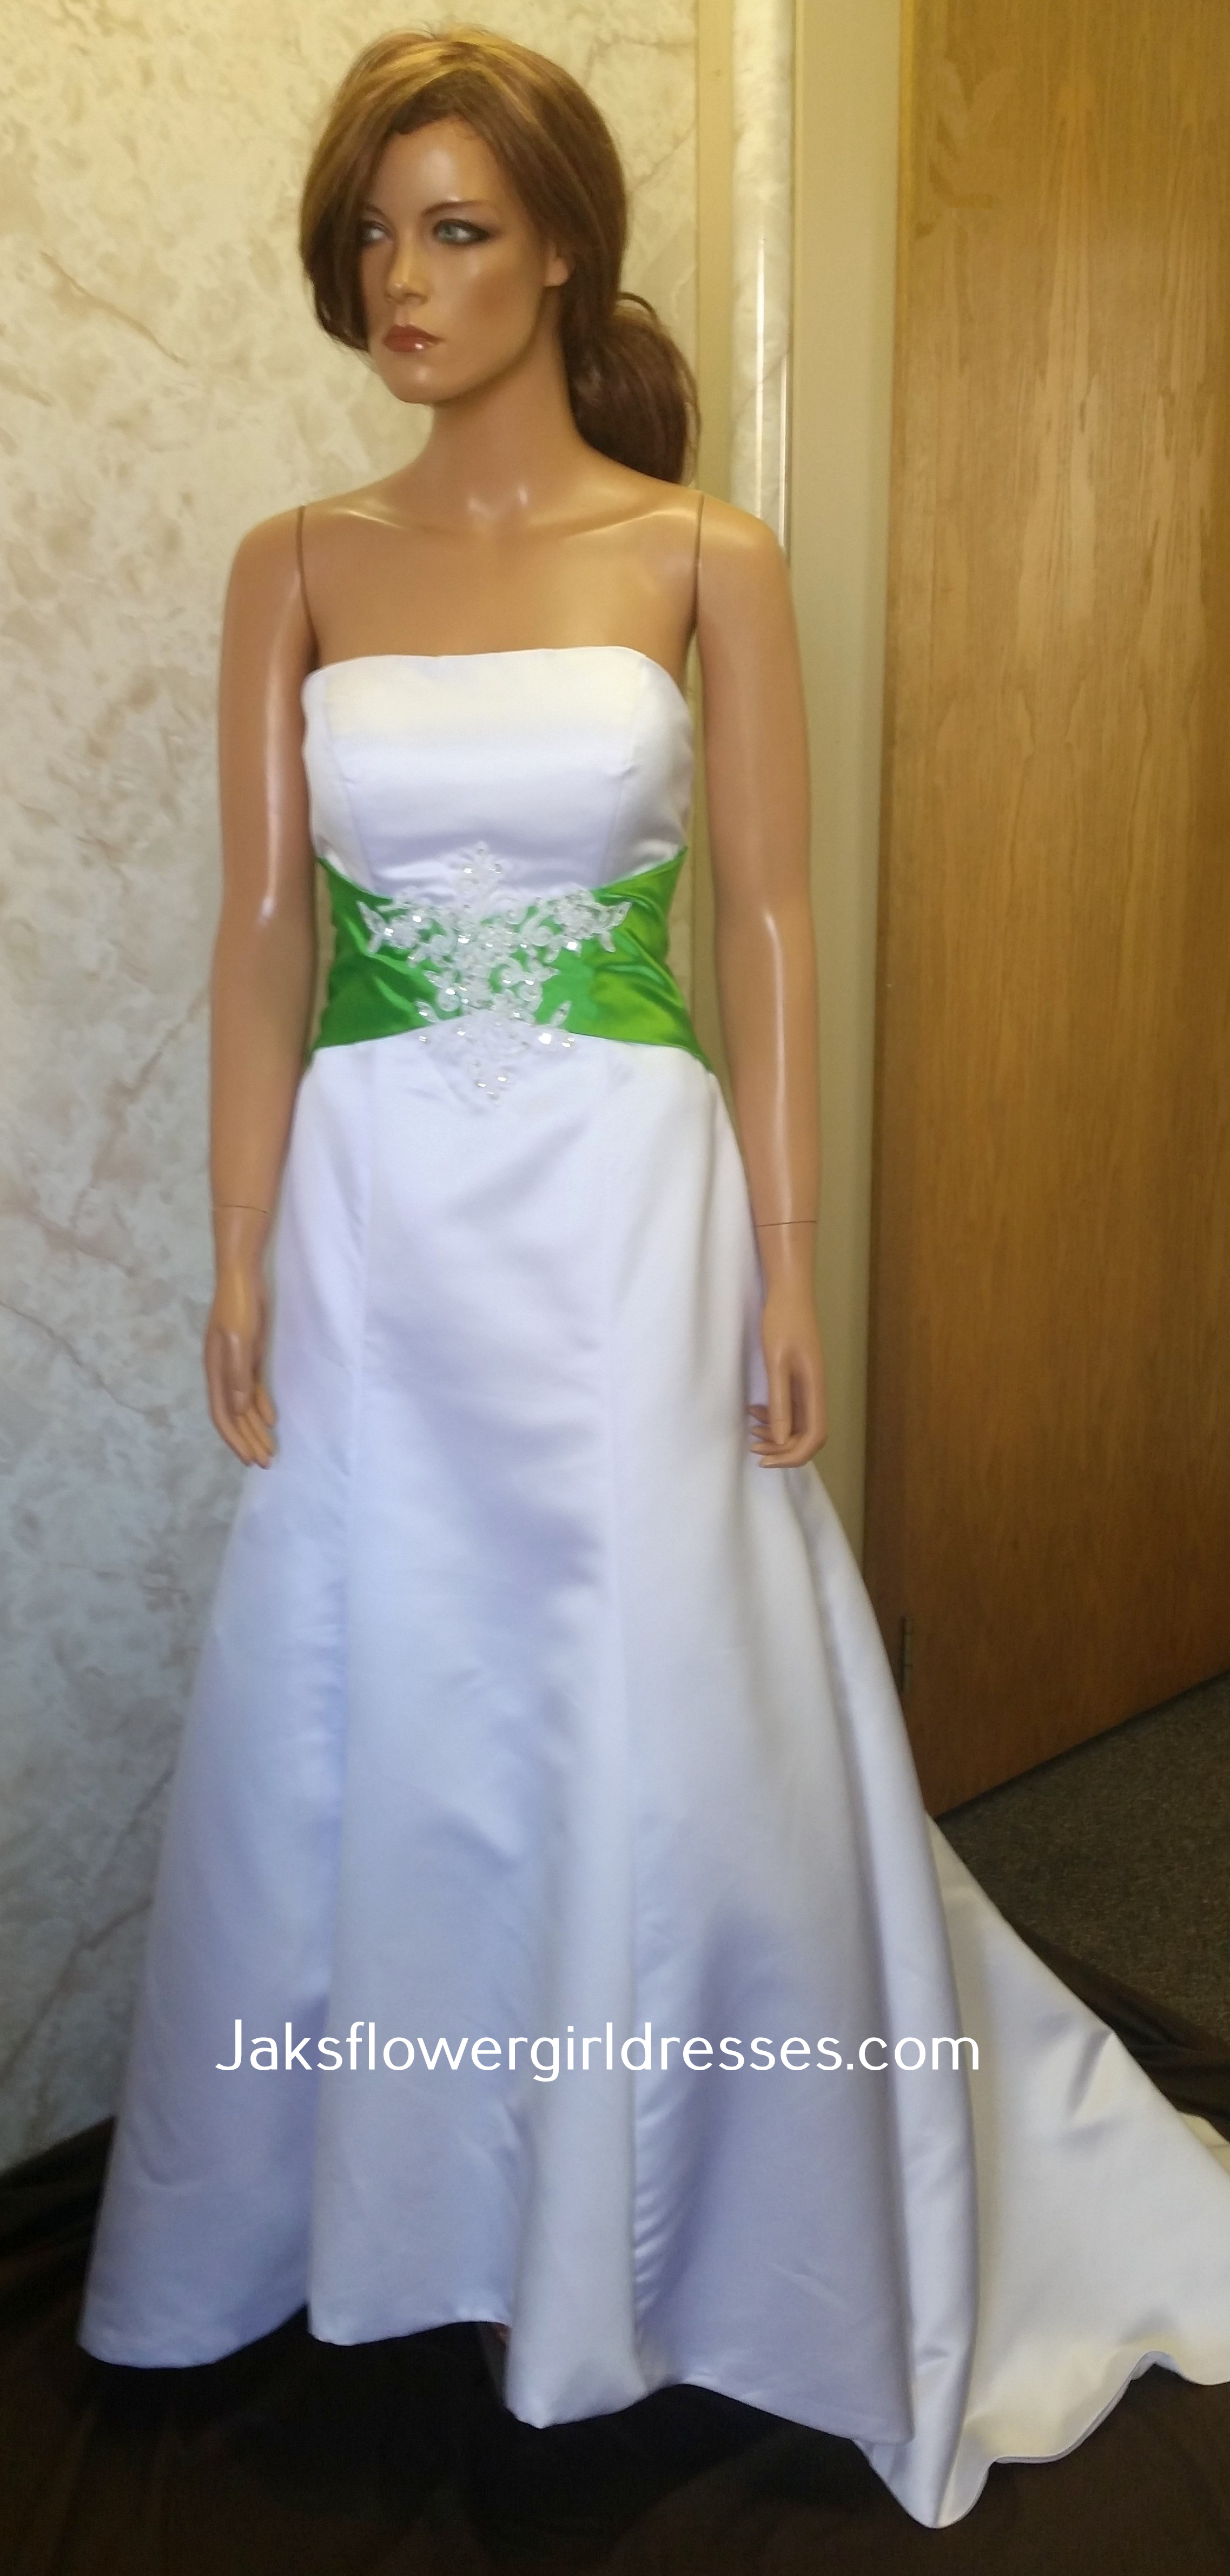 Ivory red wedding dresses.